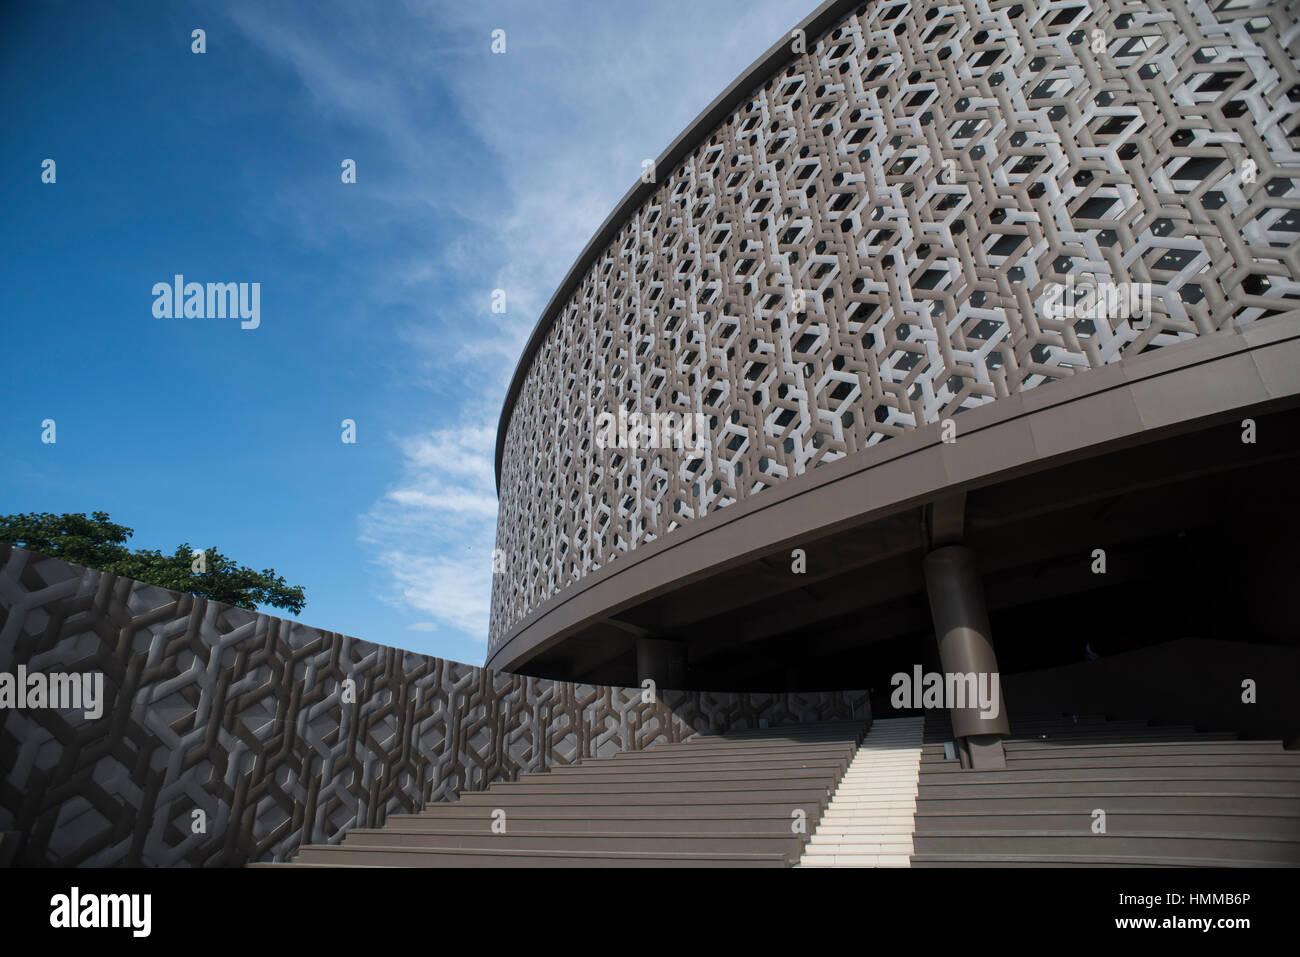 The Aceh Tsunami Museum, Banda Aceh, Sumatra, Indonesia. Stock Photo